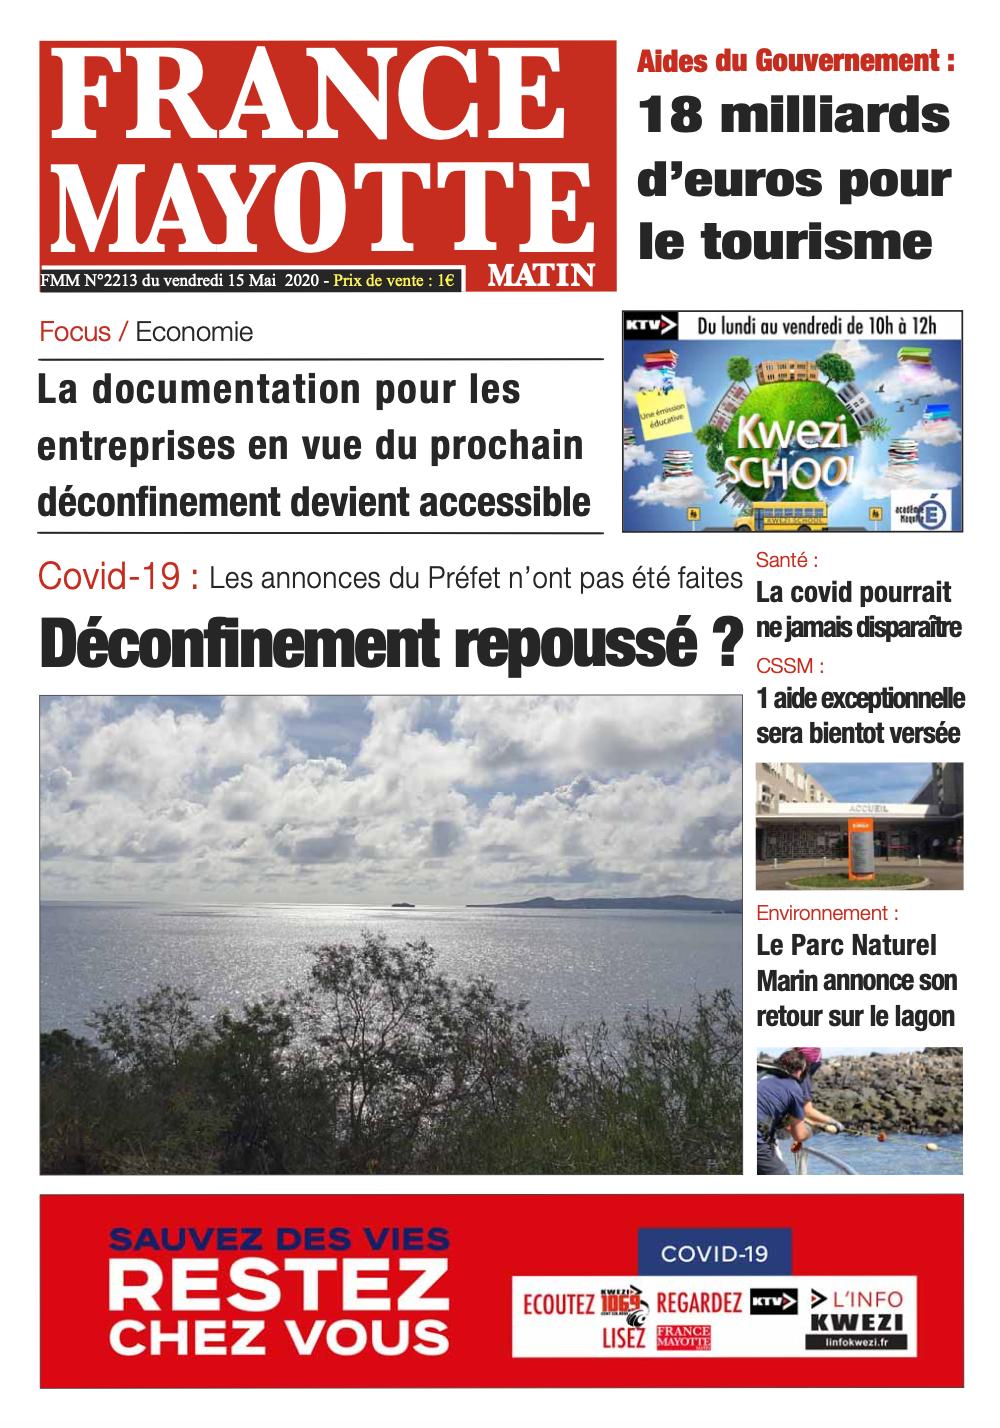 France Mayotte Vendredi 15 mai 2020